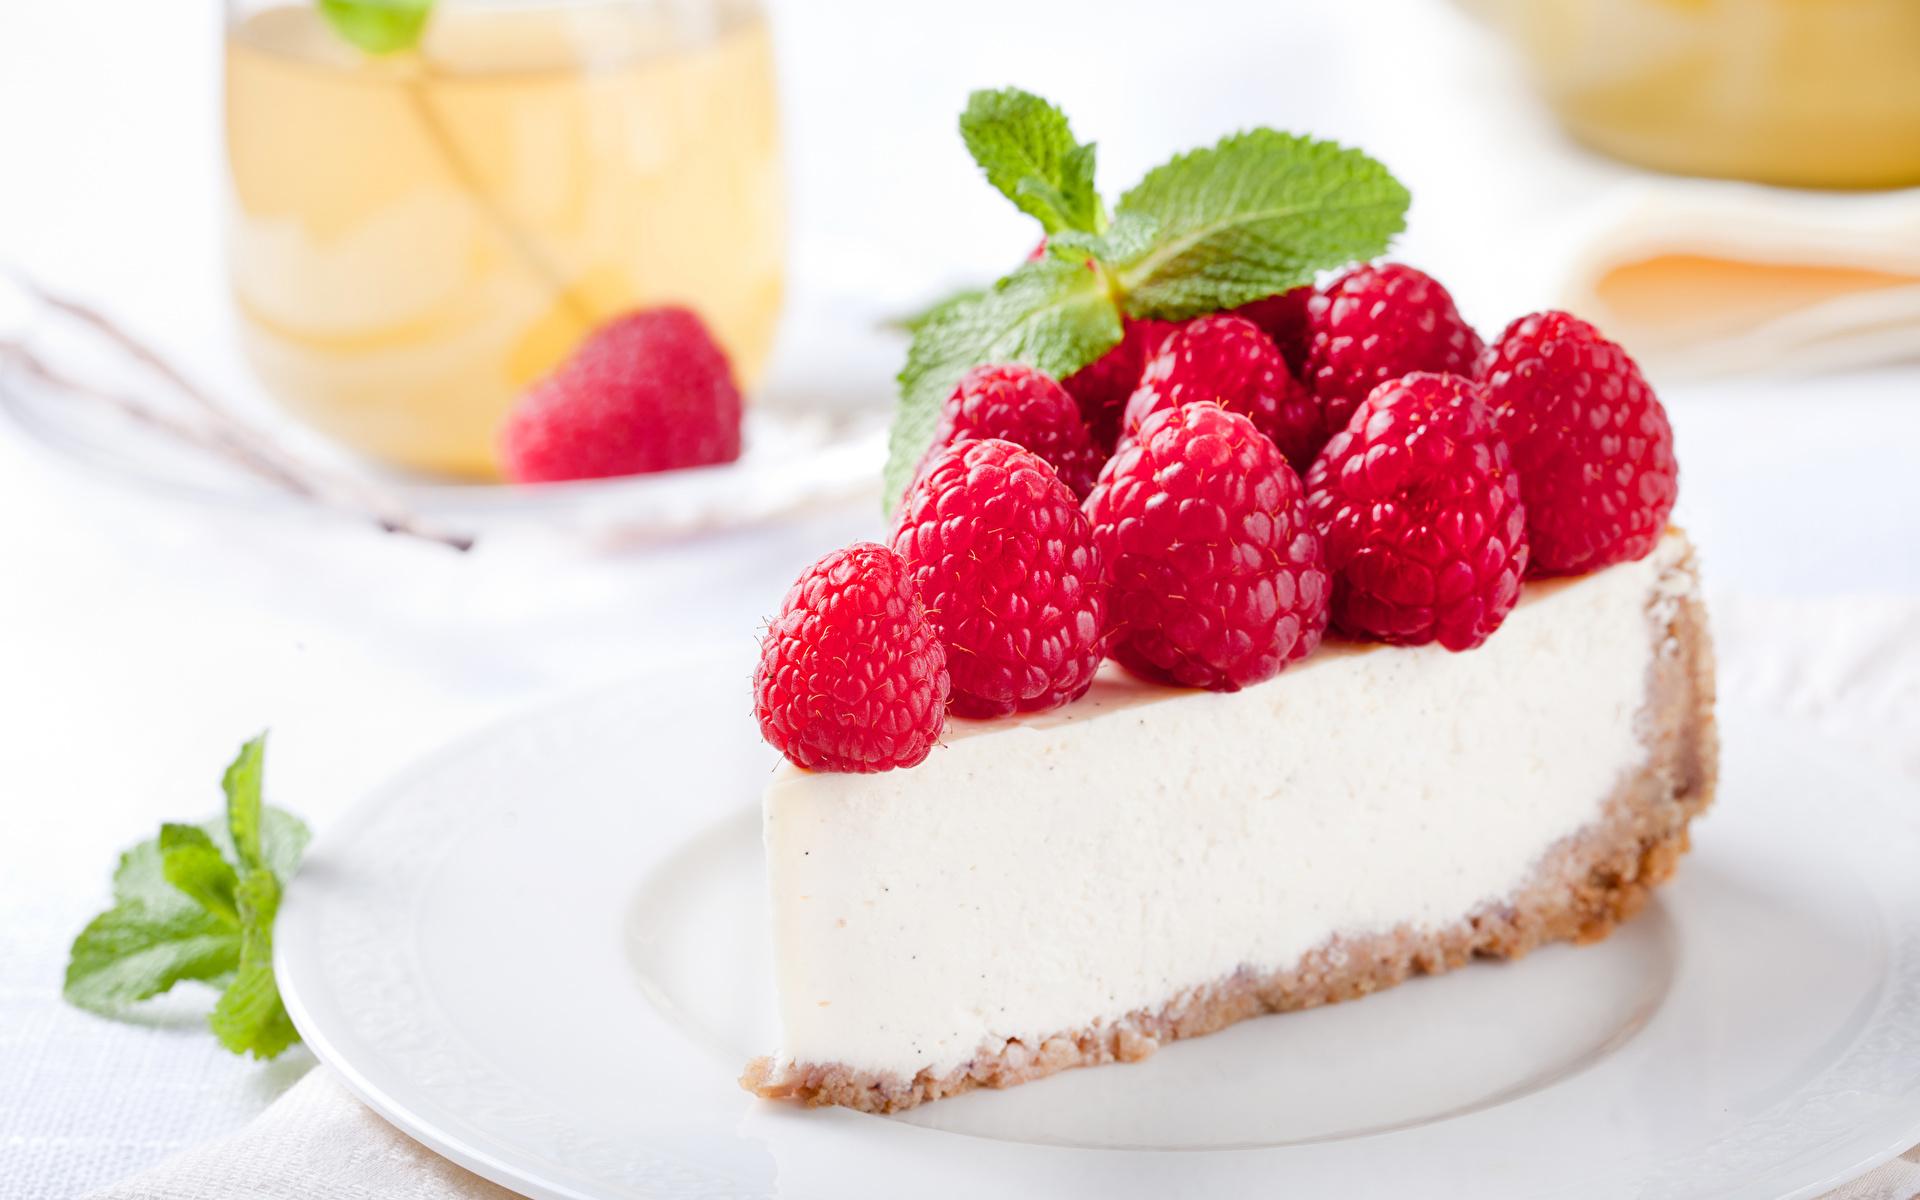 пирожное малина cake raspberry без смс